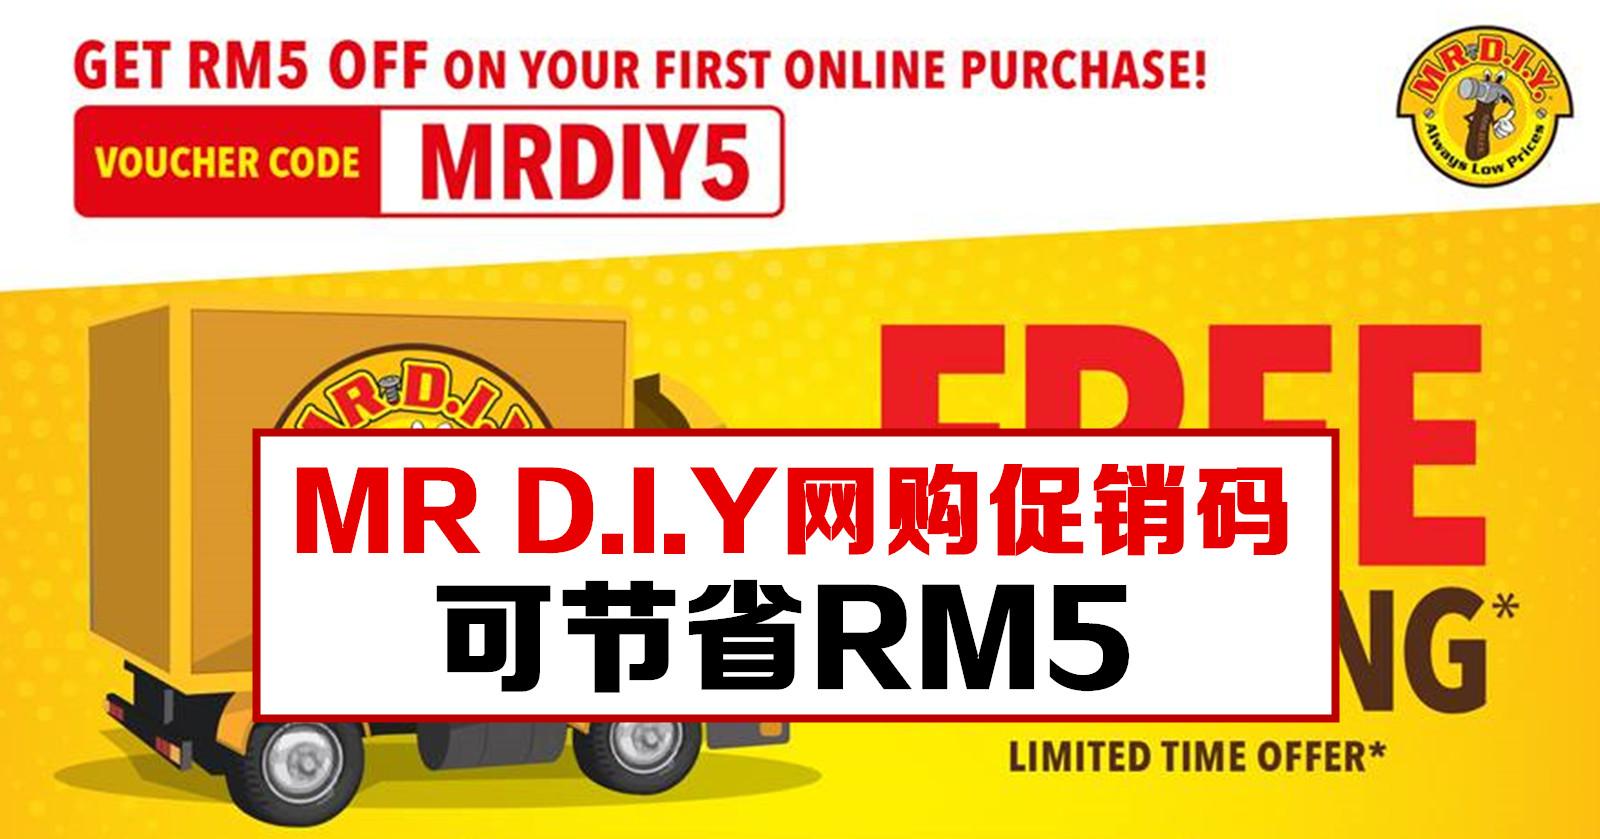 MR D.I.Y网购促销码,可节省RM5